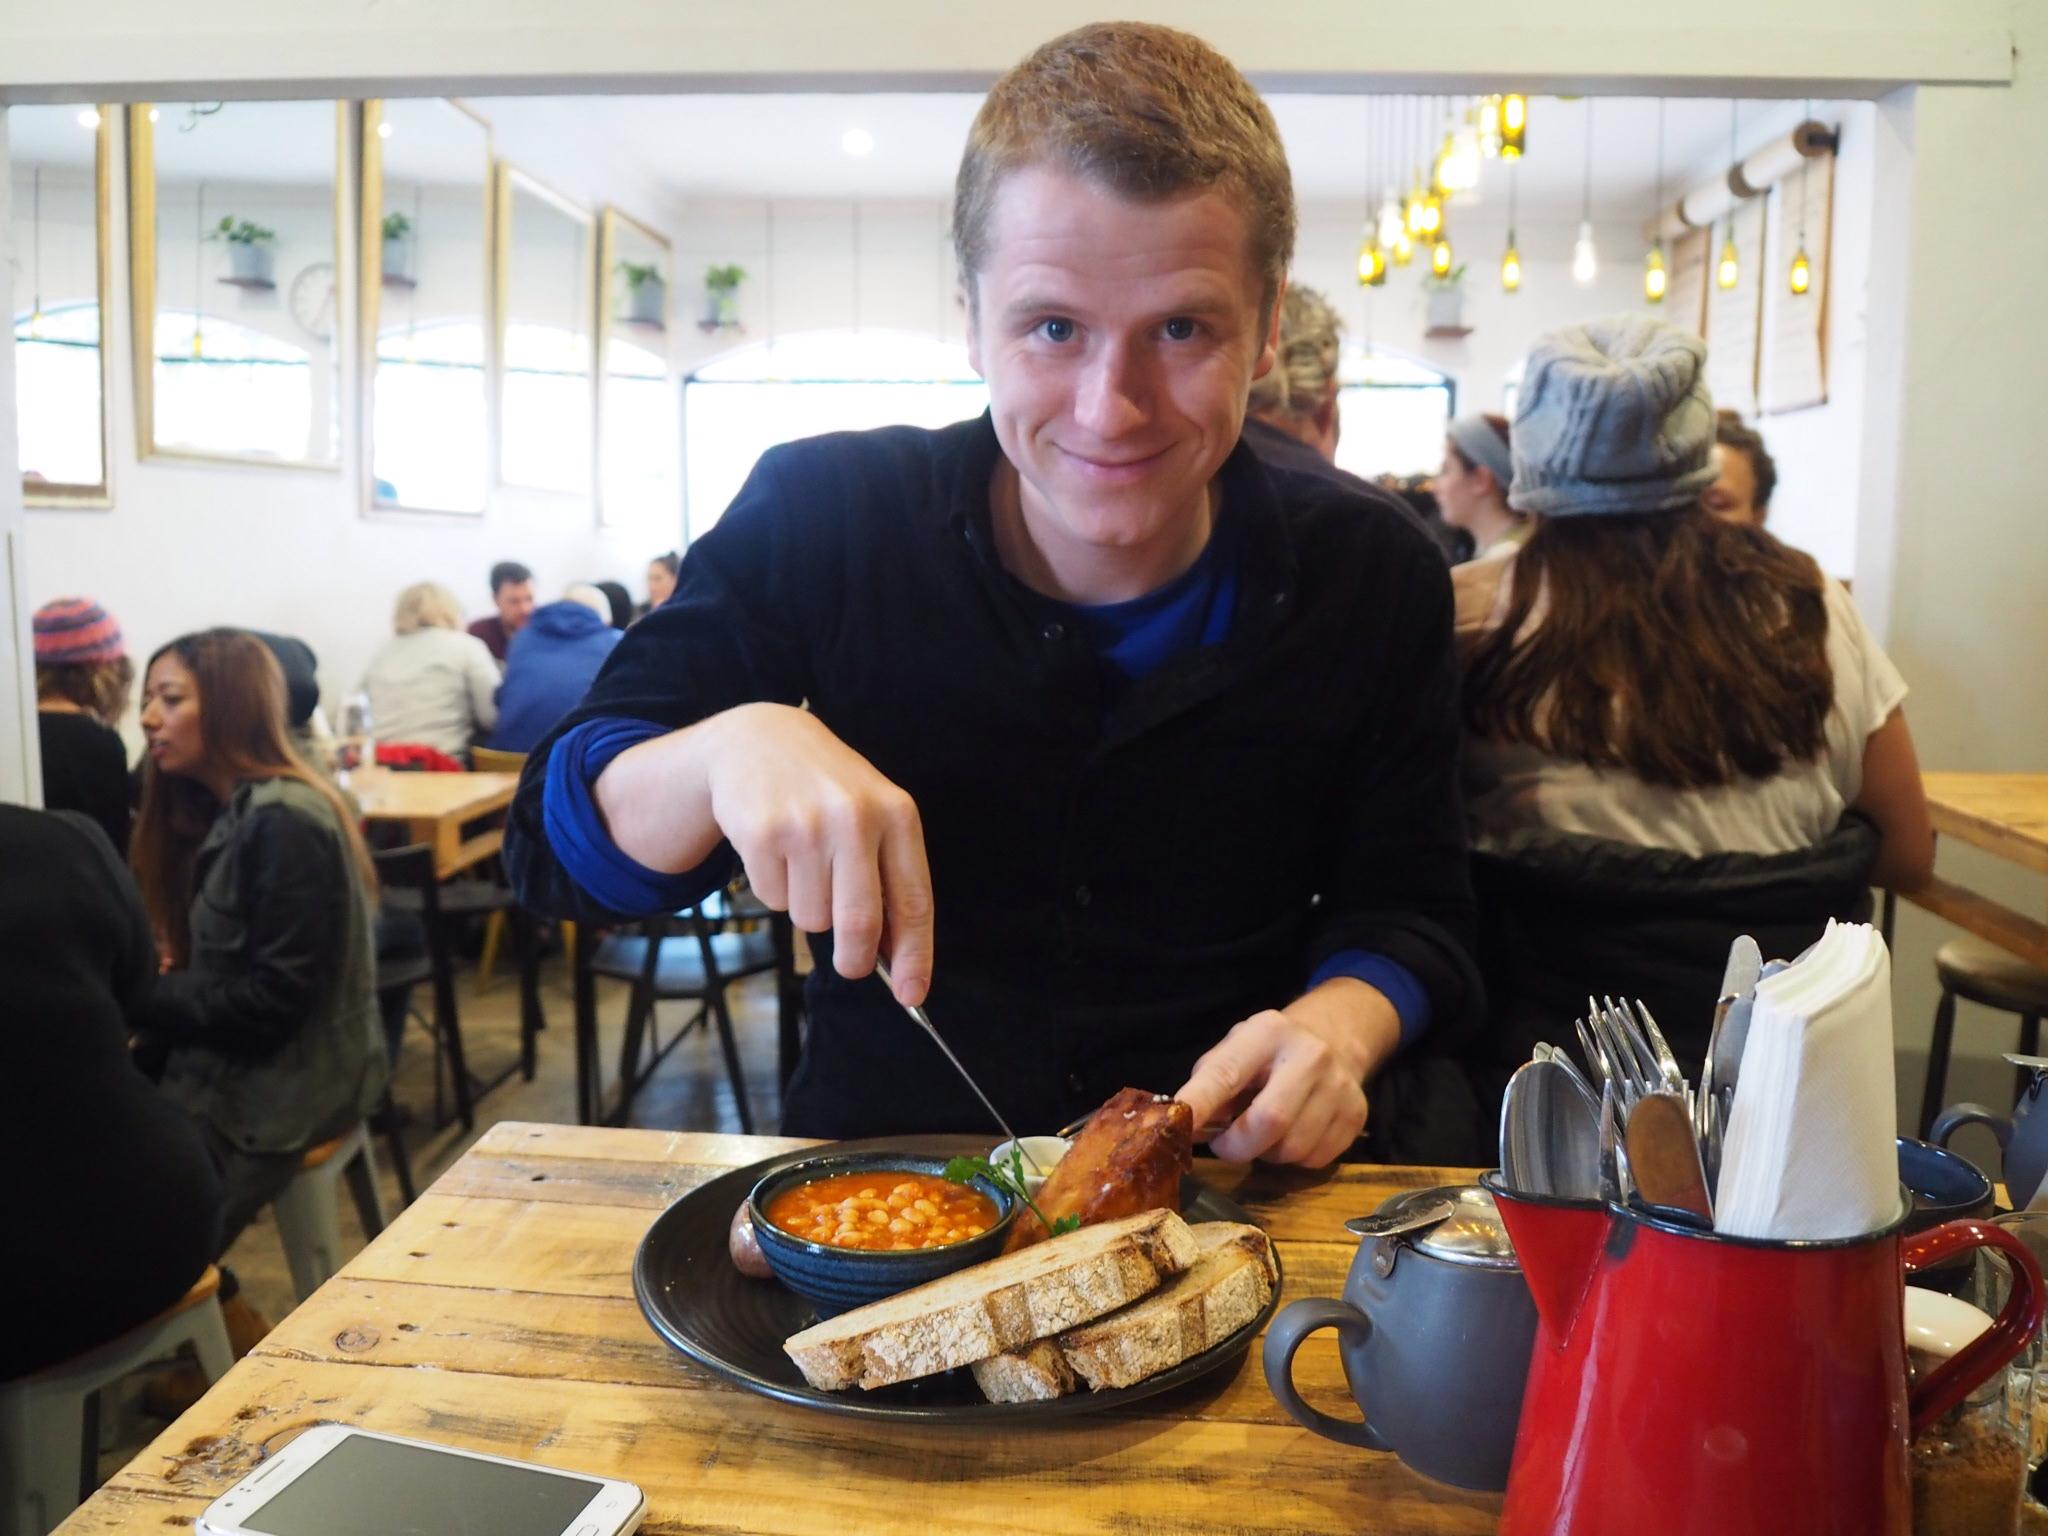 Vincent enjoying his breakfast